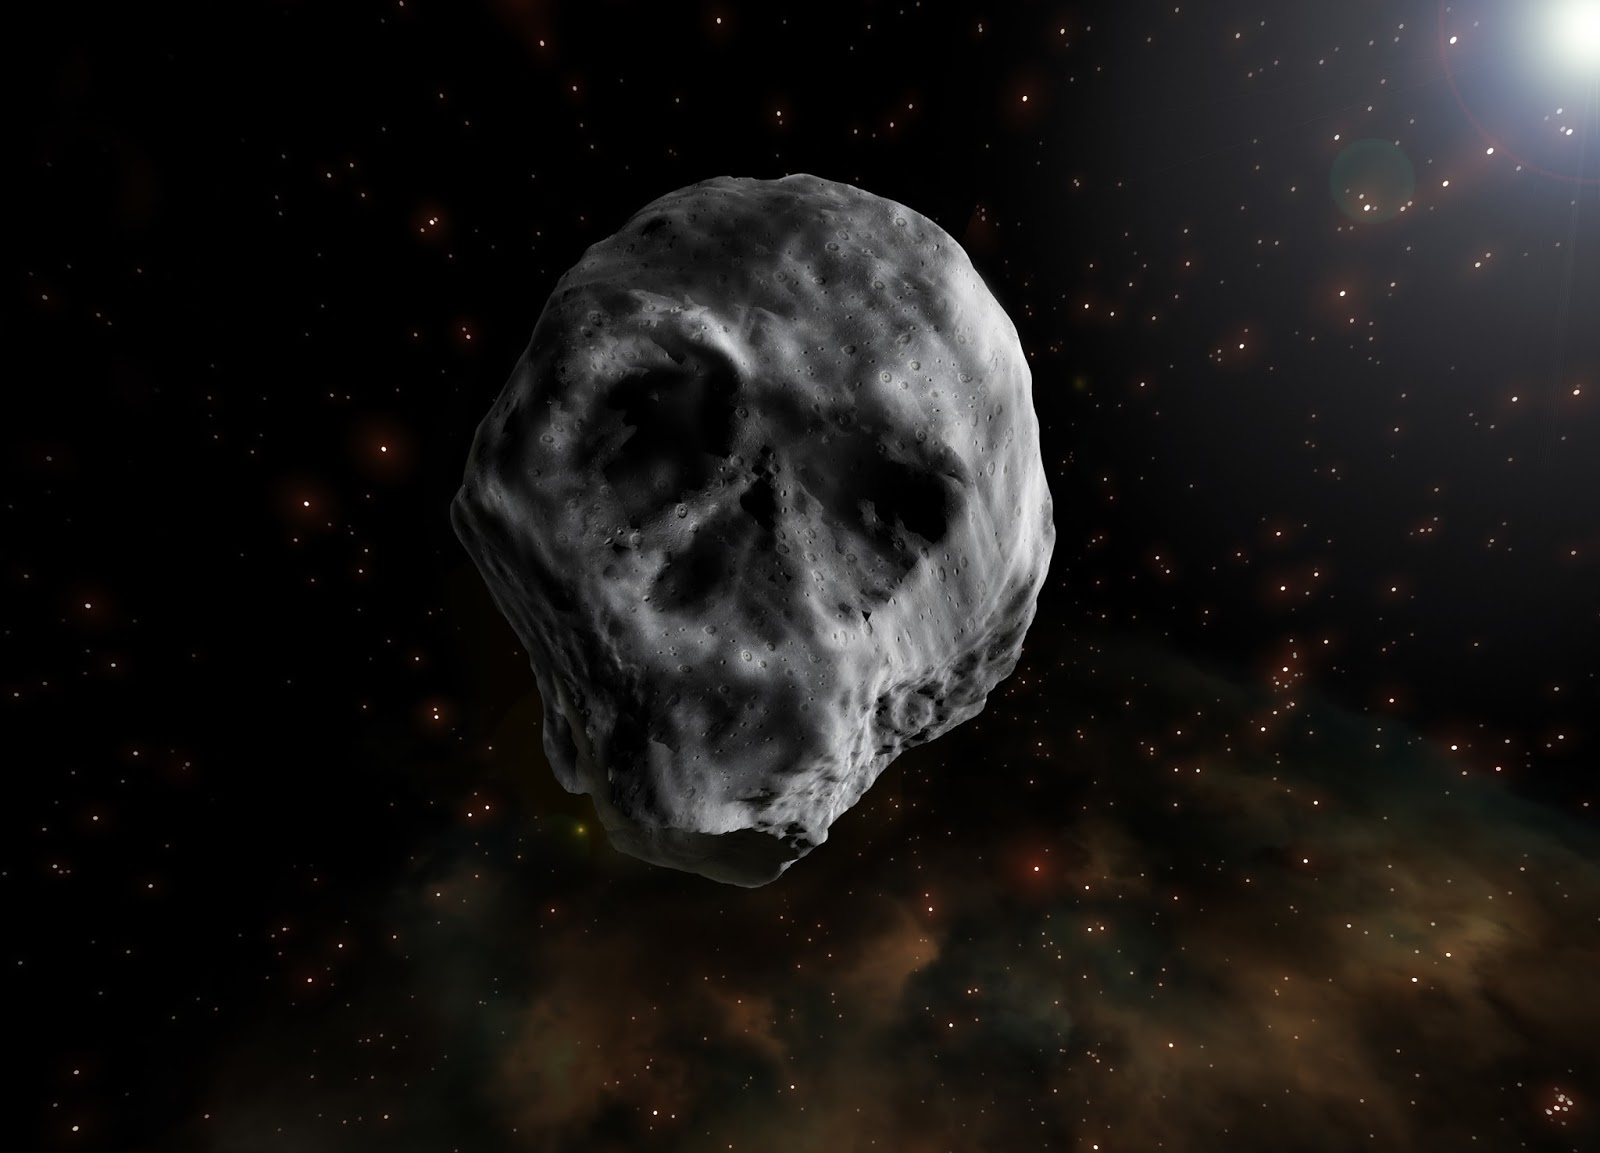 The-Halloween-Asteroid-Prepares-To-Return-In-2020 Halloween asteroid prepares to return in 2018   The Archaeology